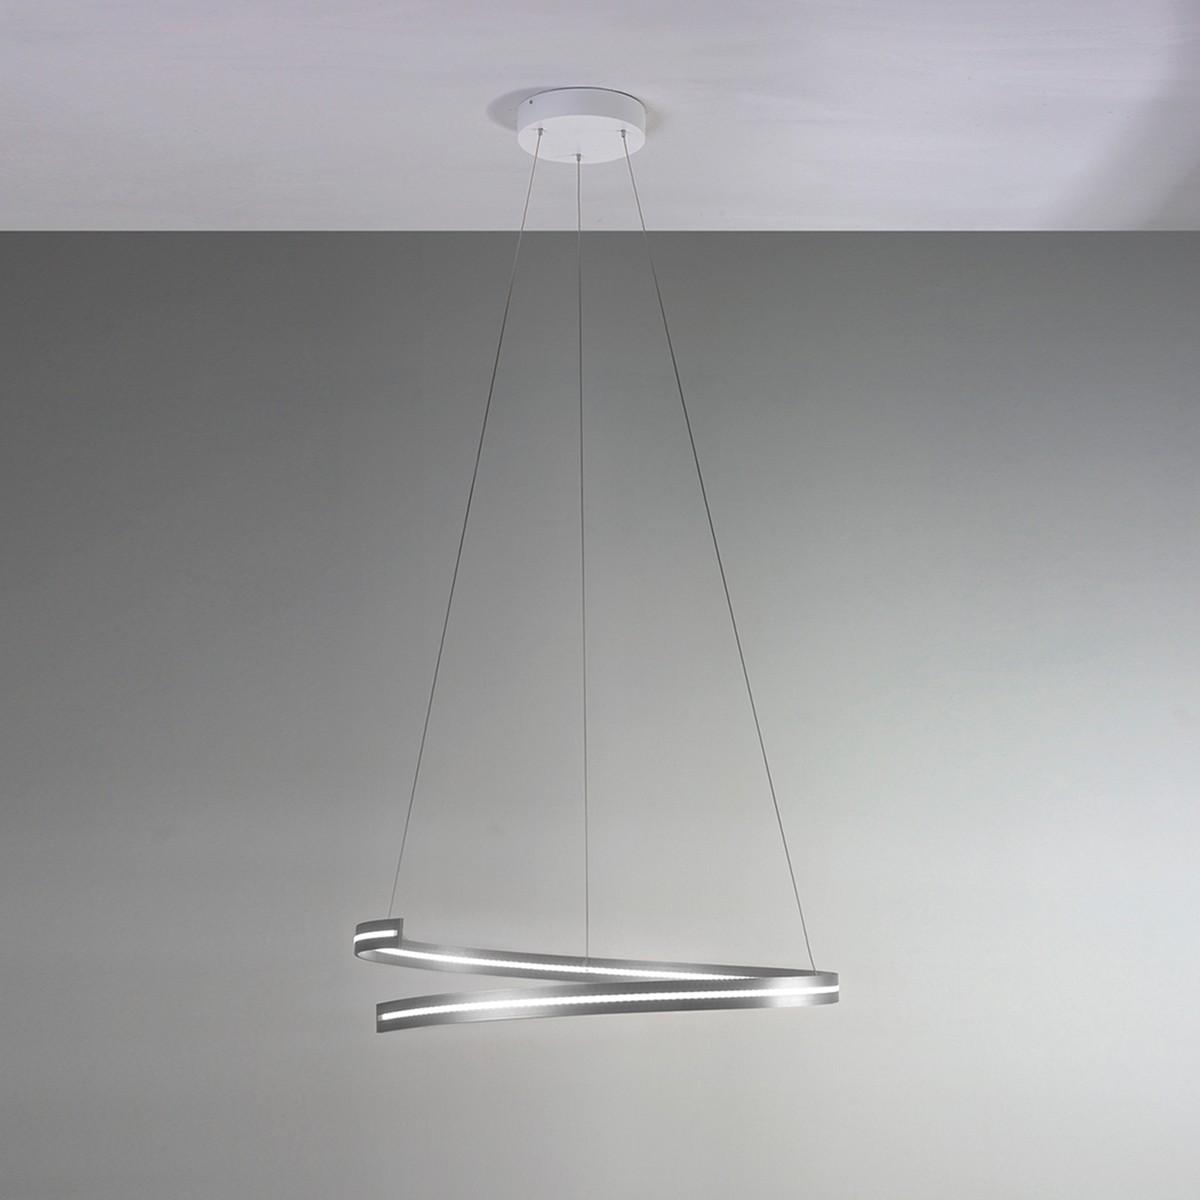 Bopp Break LED Pendelleuchte Ø: 70 cm, Aluminium geschliffen